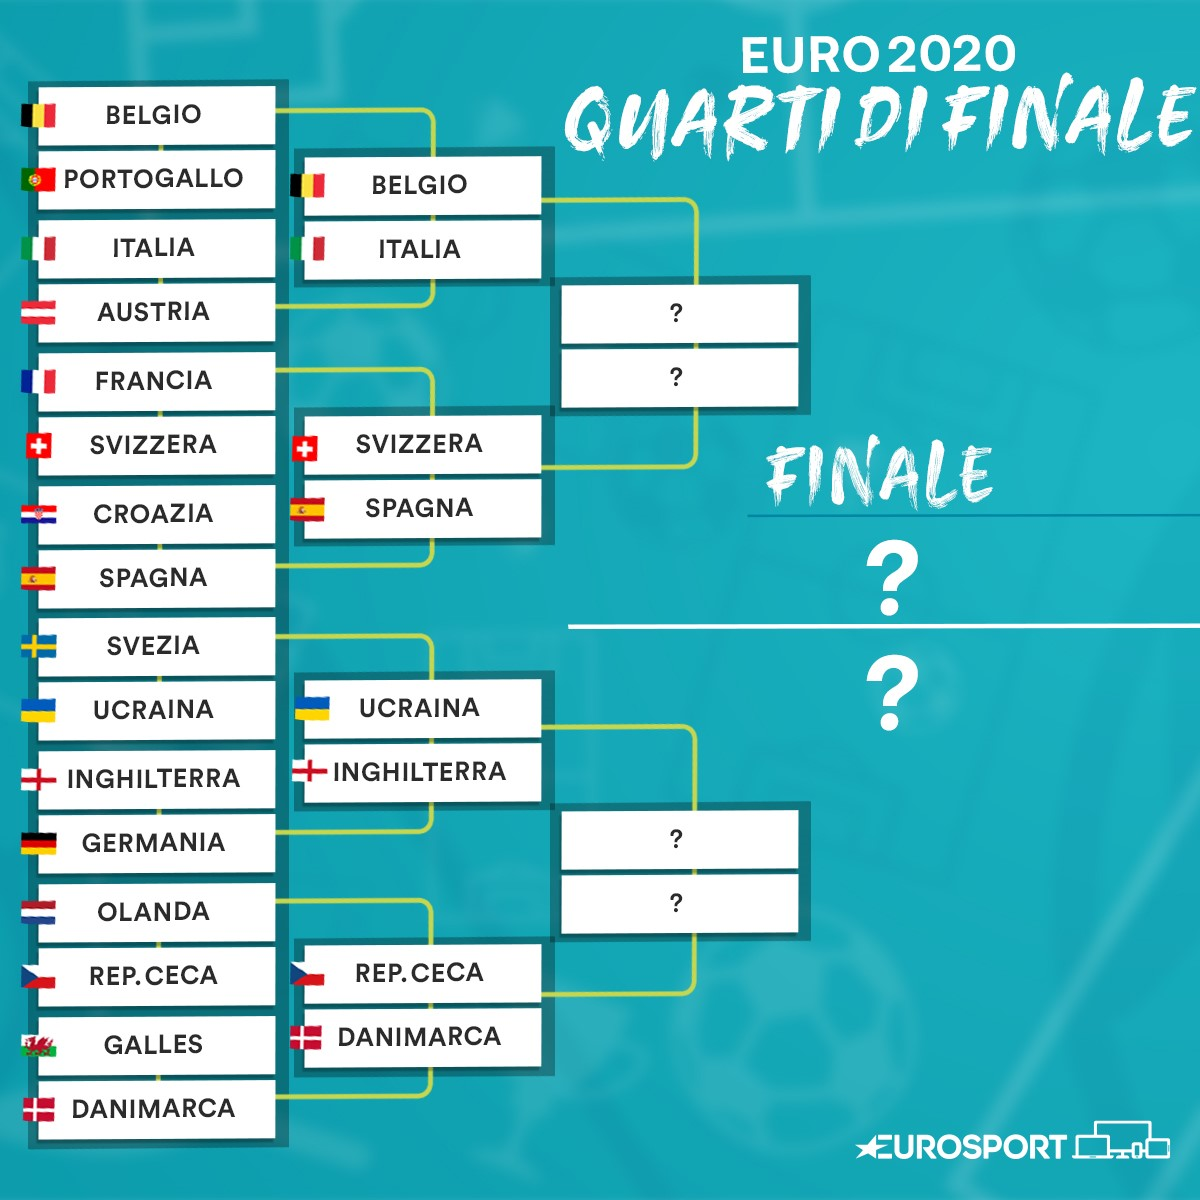 https://i.eurosport.com/2021/06/29/3164140.jpg